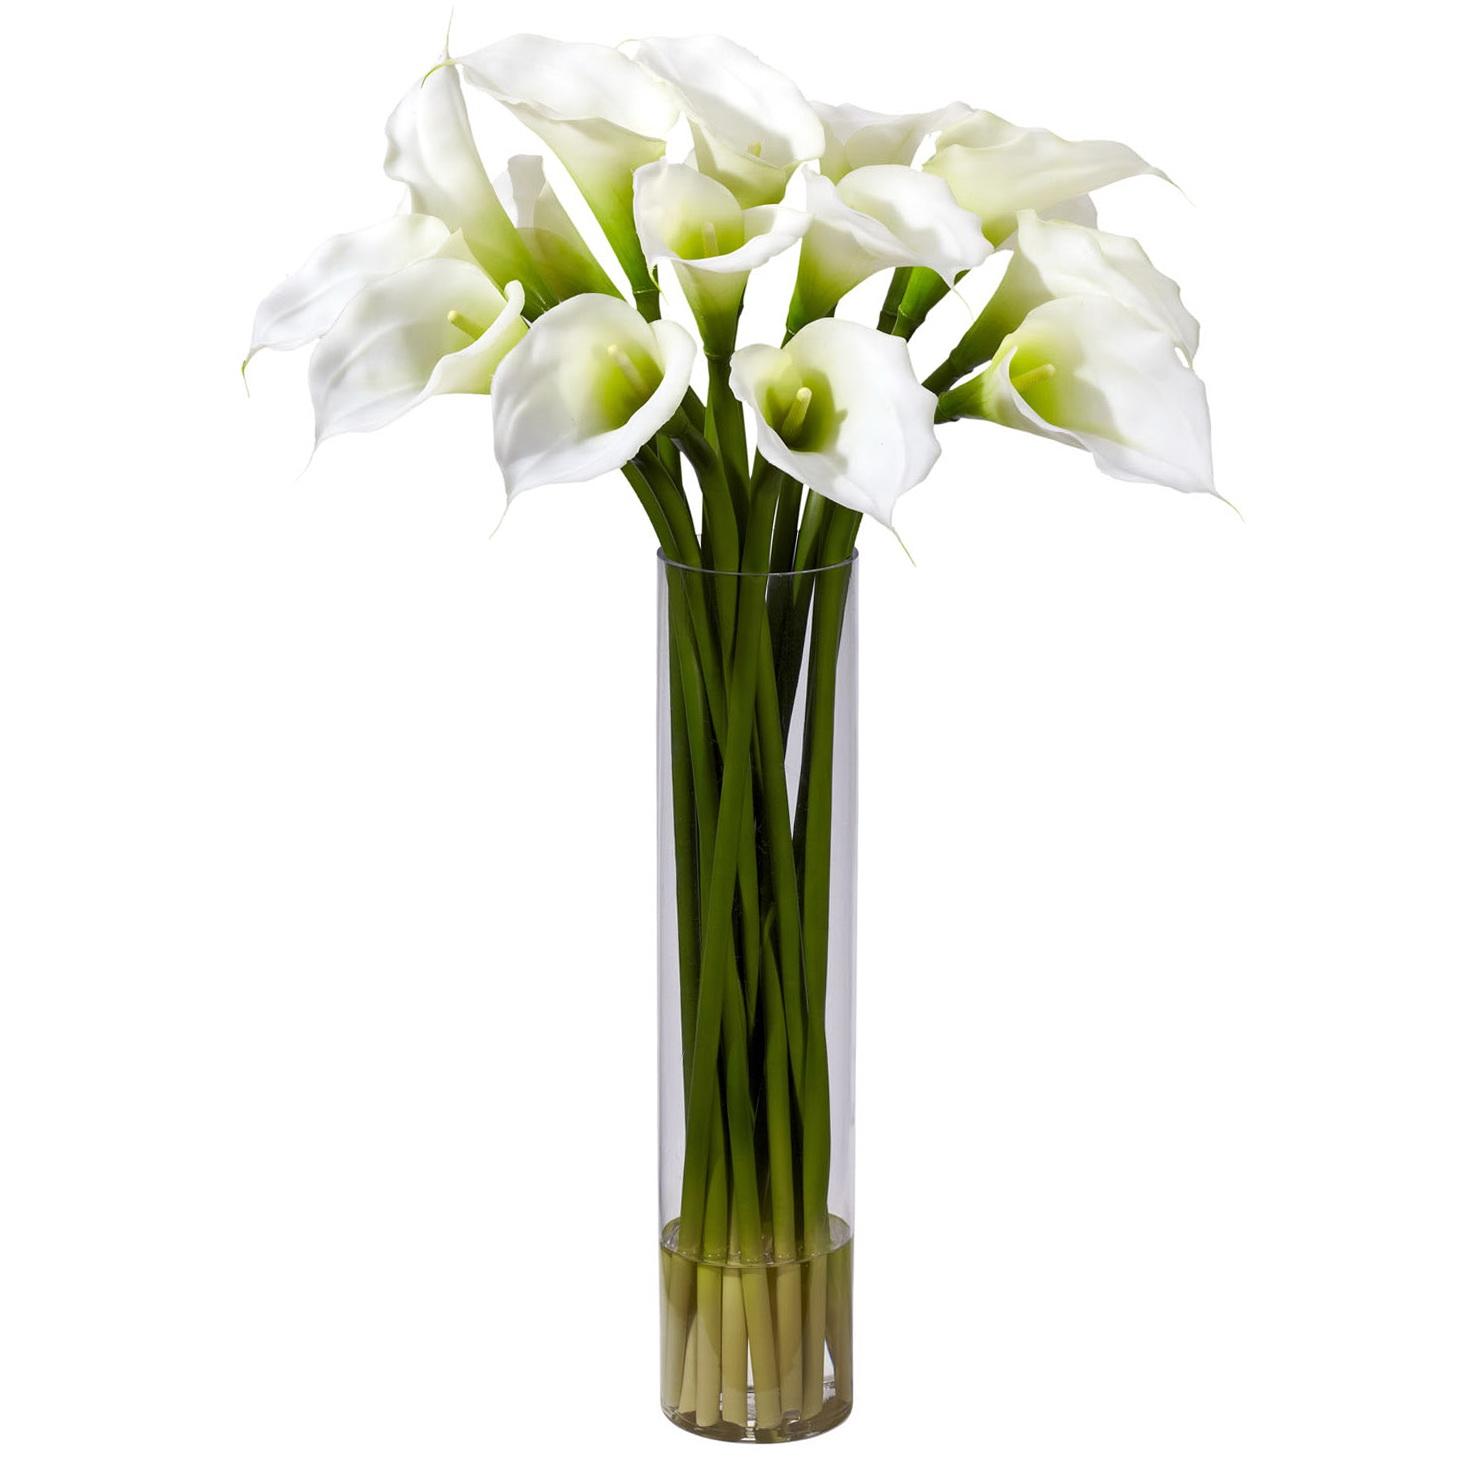 Cheap Glass Vases Tall Home Design Ideas